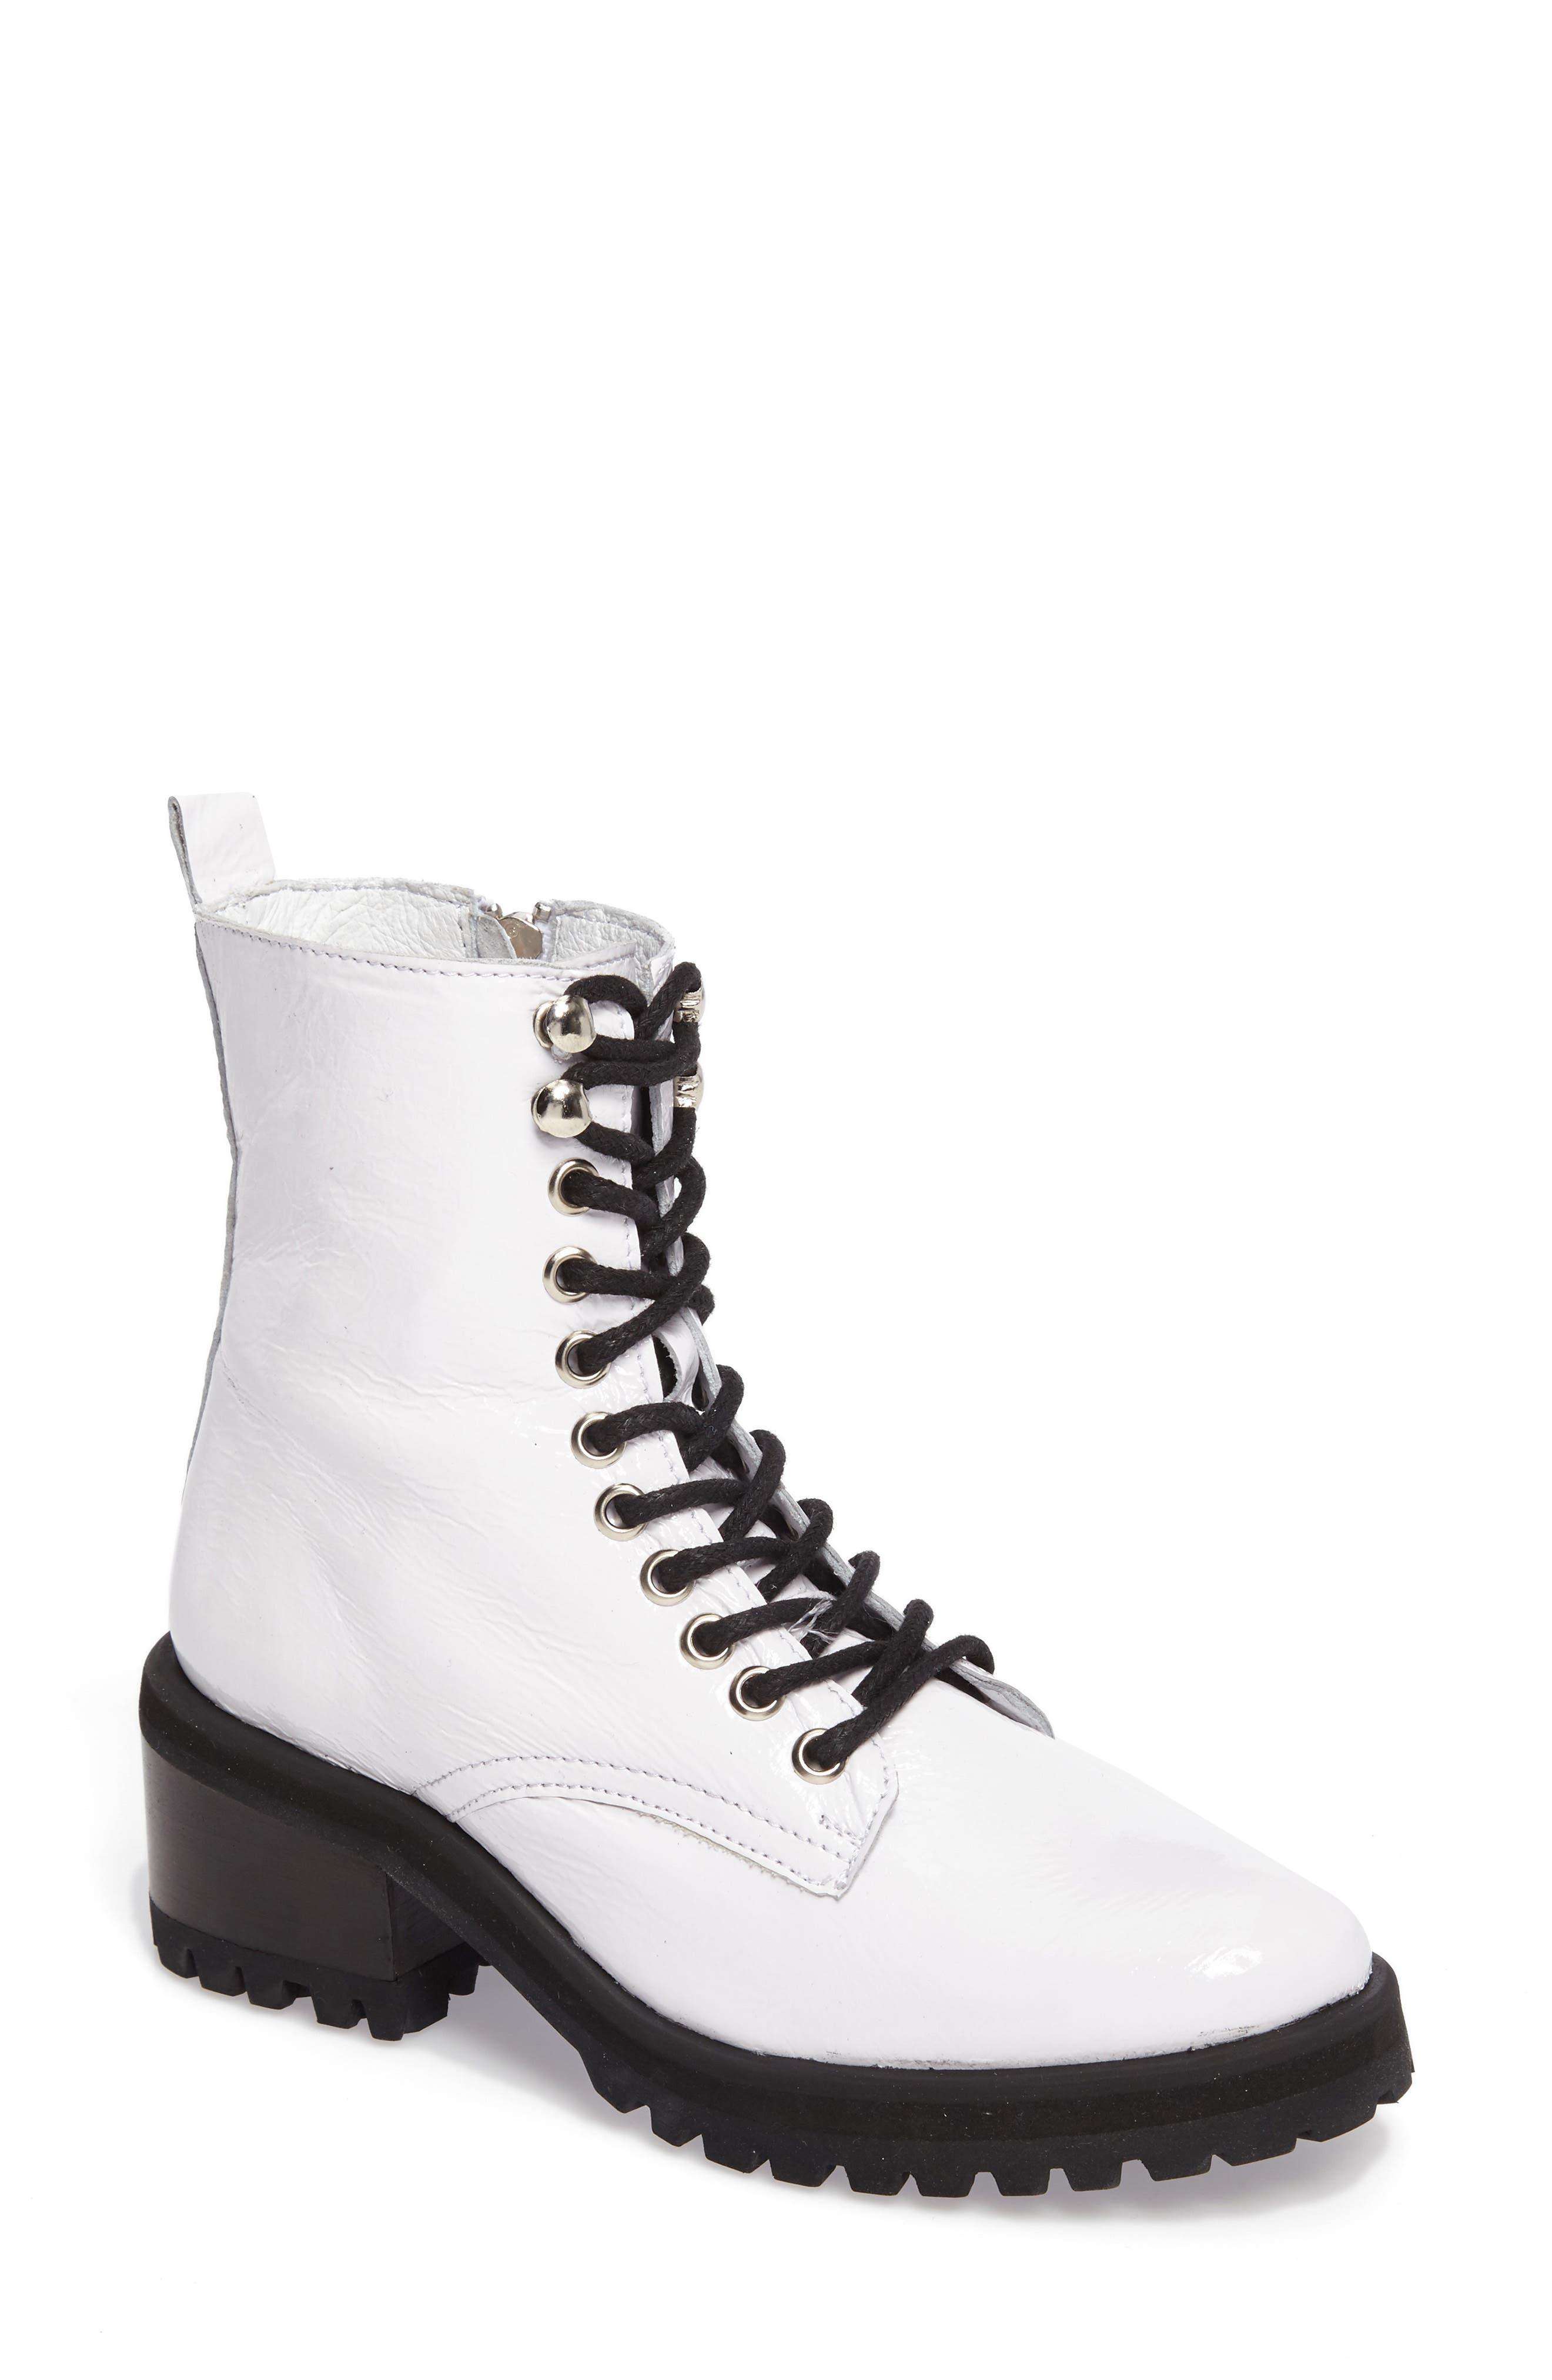 Geneva Bootie,                             Main thumbnail 1, color,                             White Patent Leather